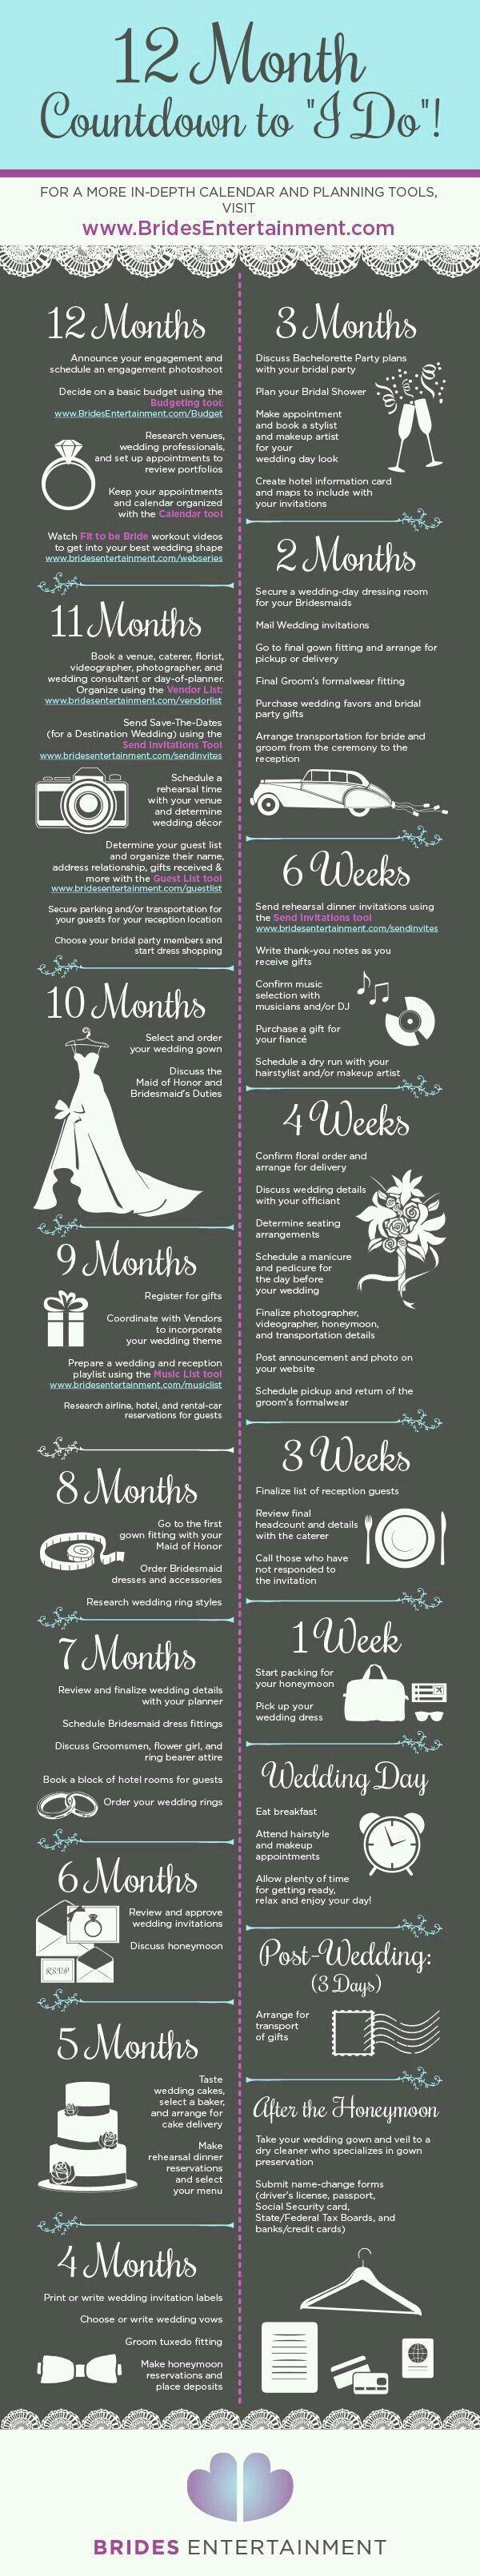 important wedding planning timeline ideas #weddingplanningchecklist #weddingplanninginfographic